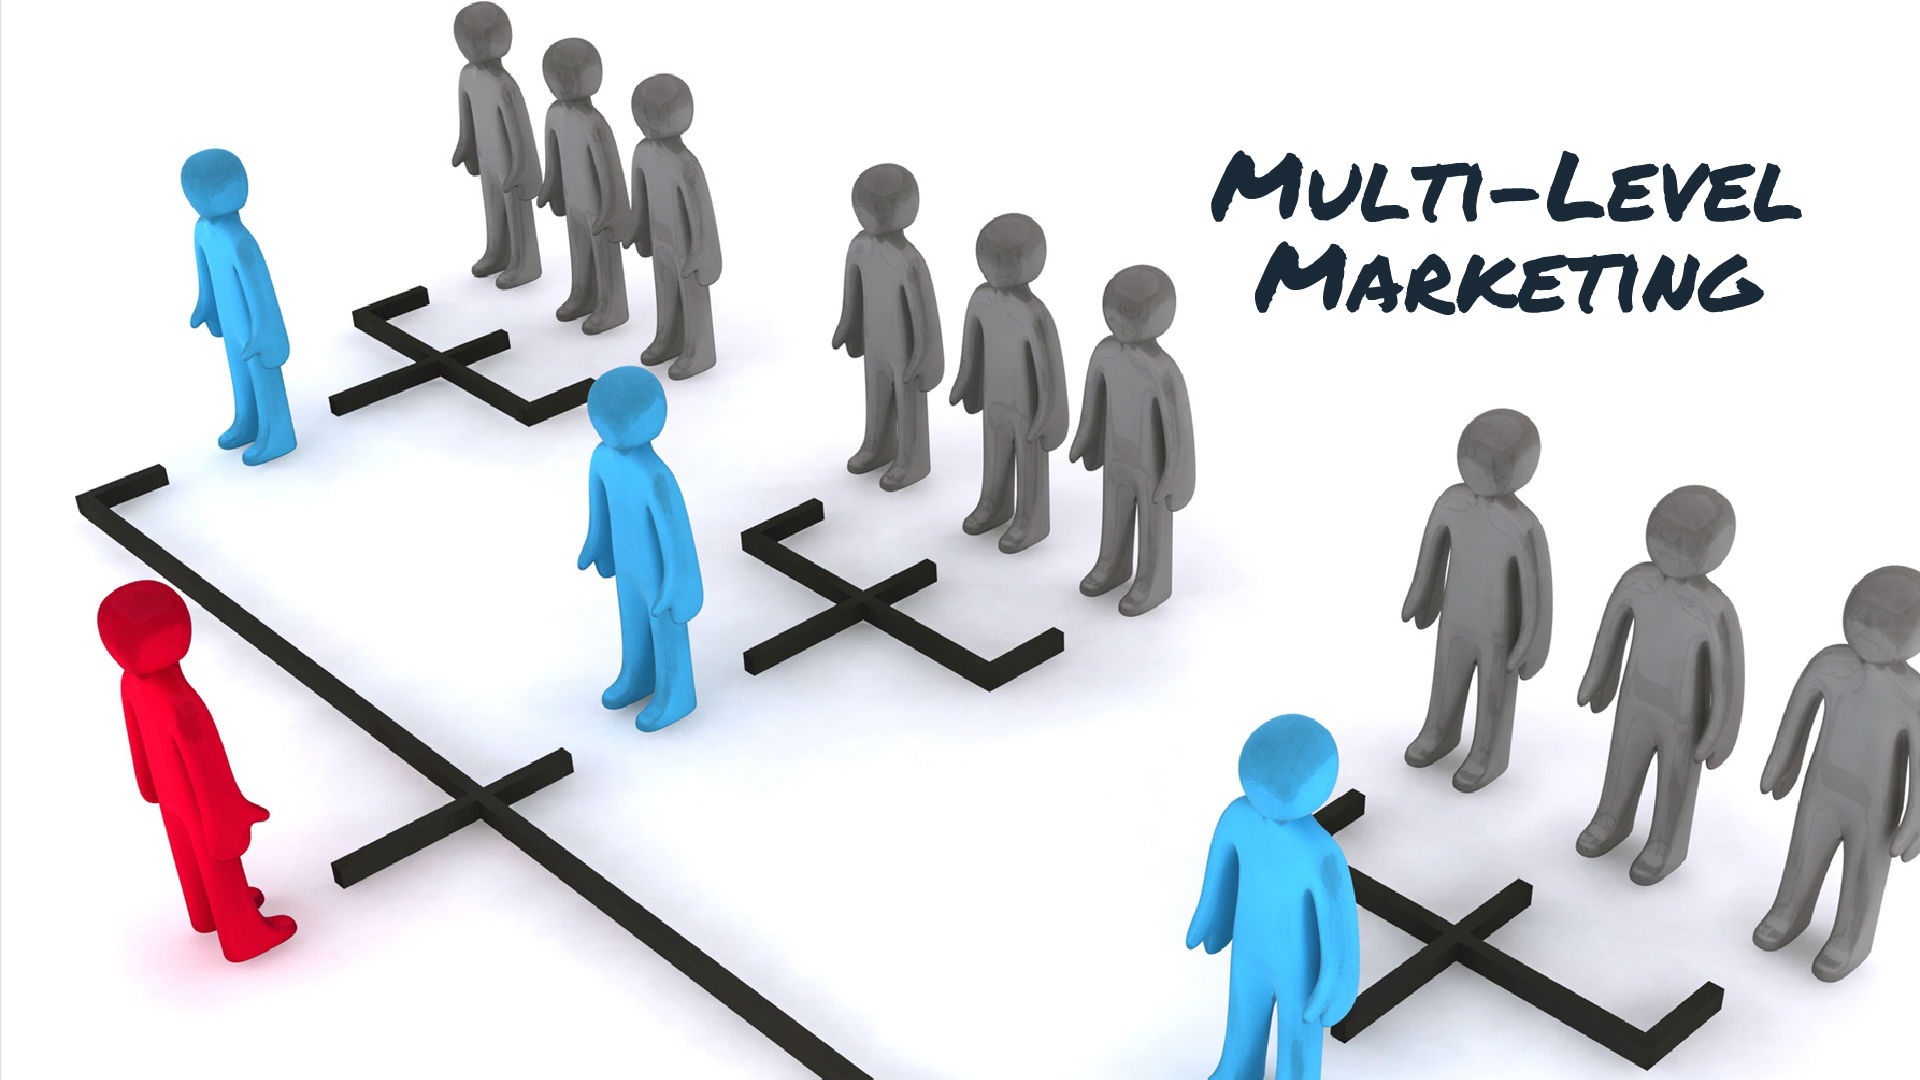 Multilevelmarketing